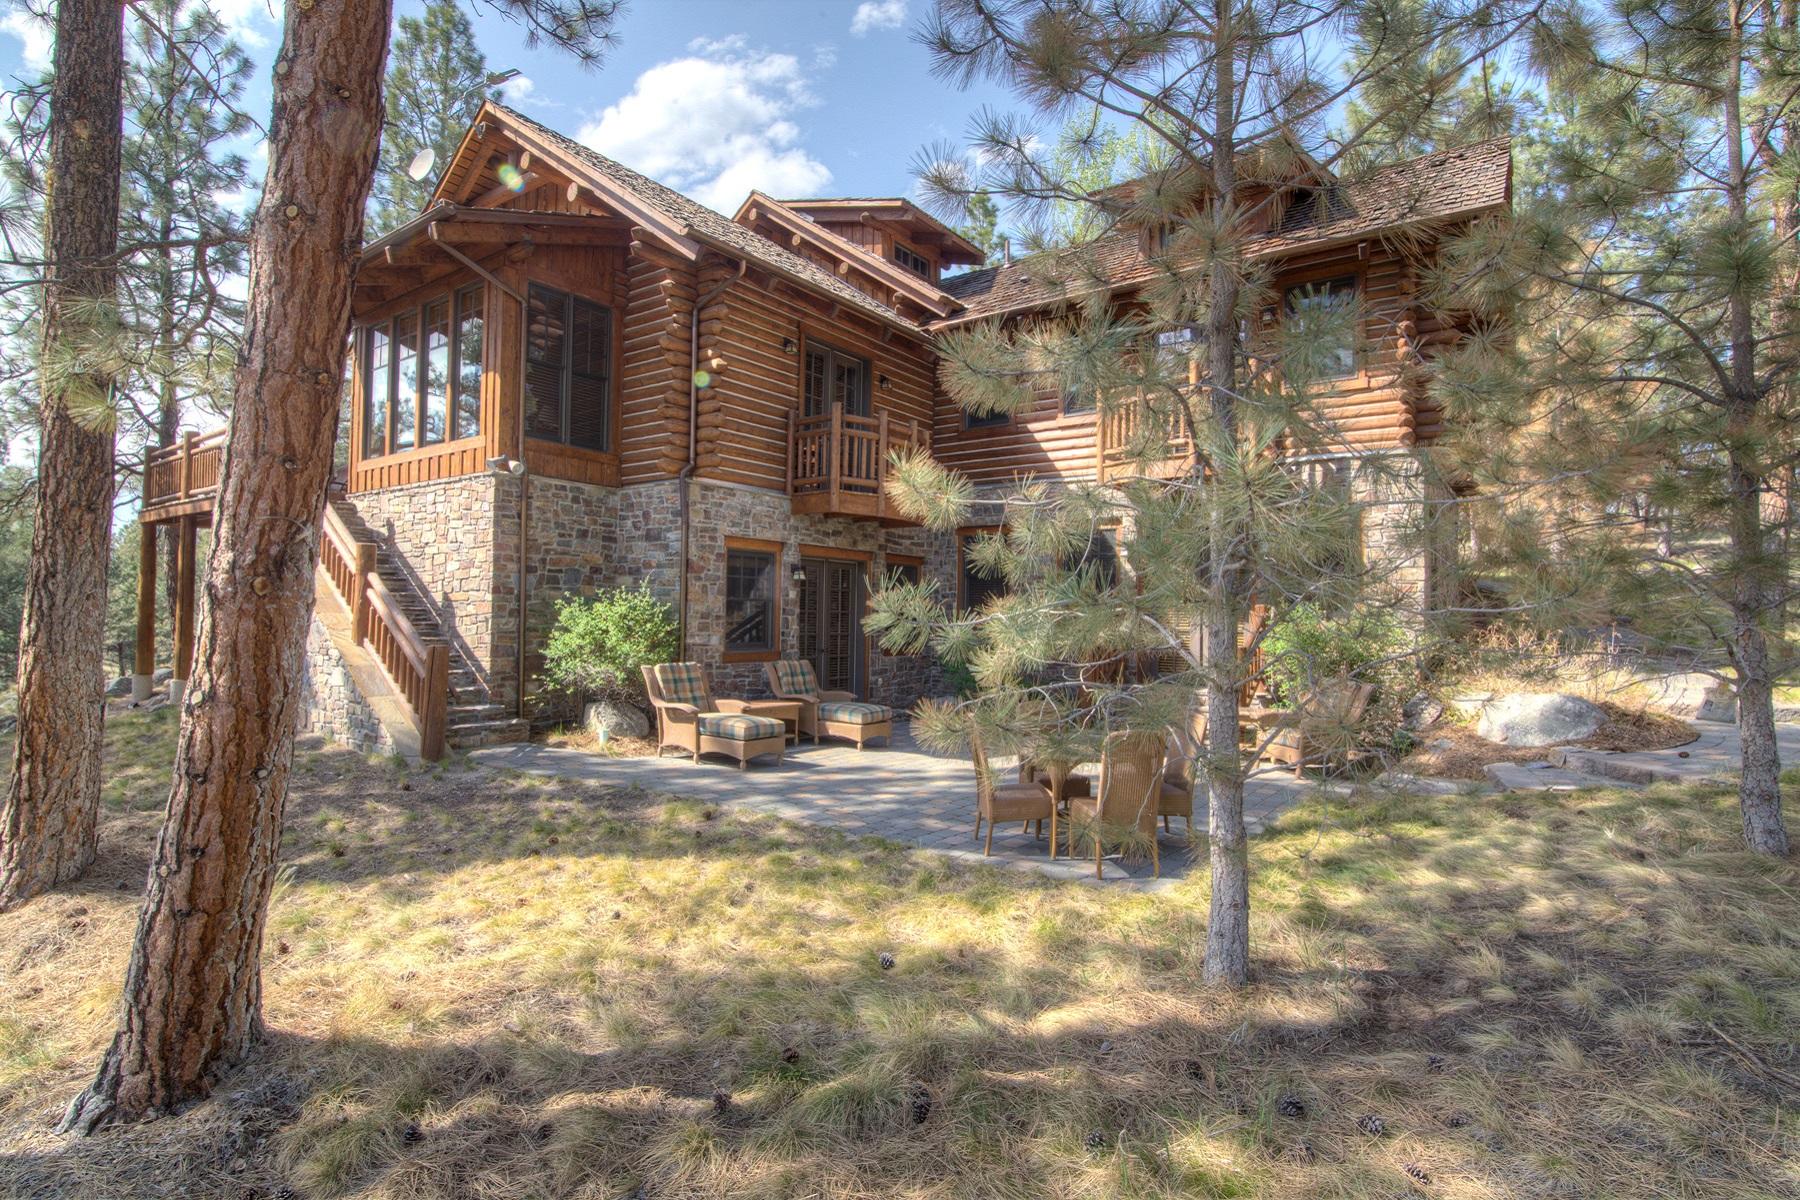 Single Family Home for Sale at Stock Farm Cabin 8 726 Pallo Trail Hamilton, Montana, 59840 United States